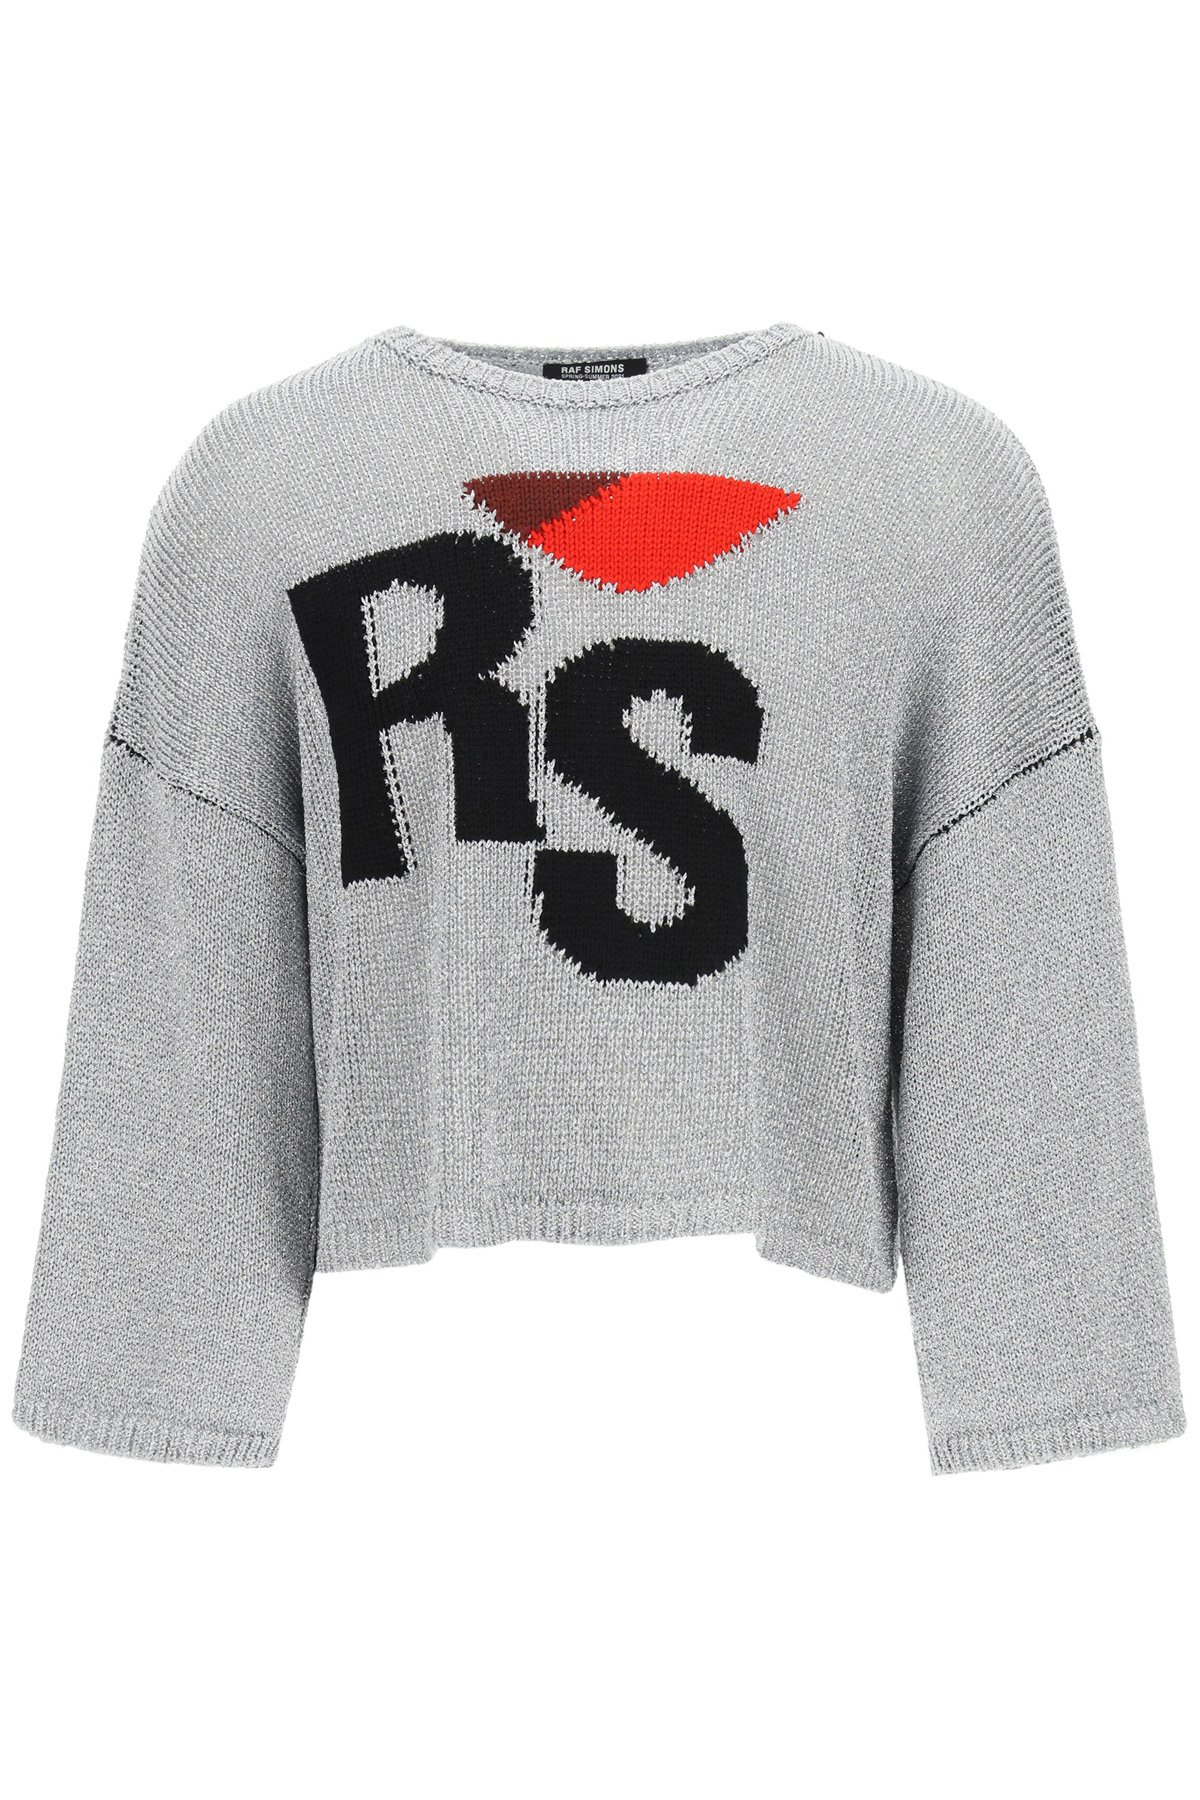 Raf simons pullover oversize ricamo rs